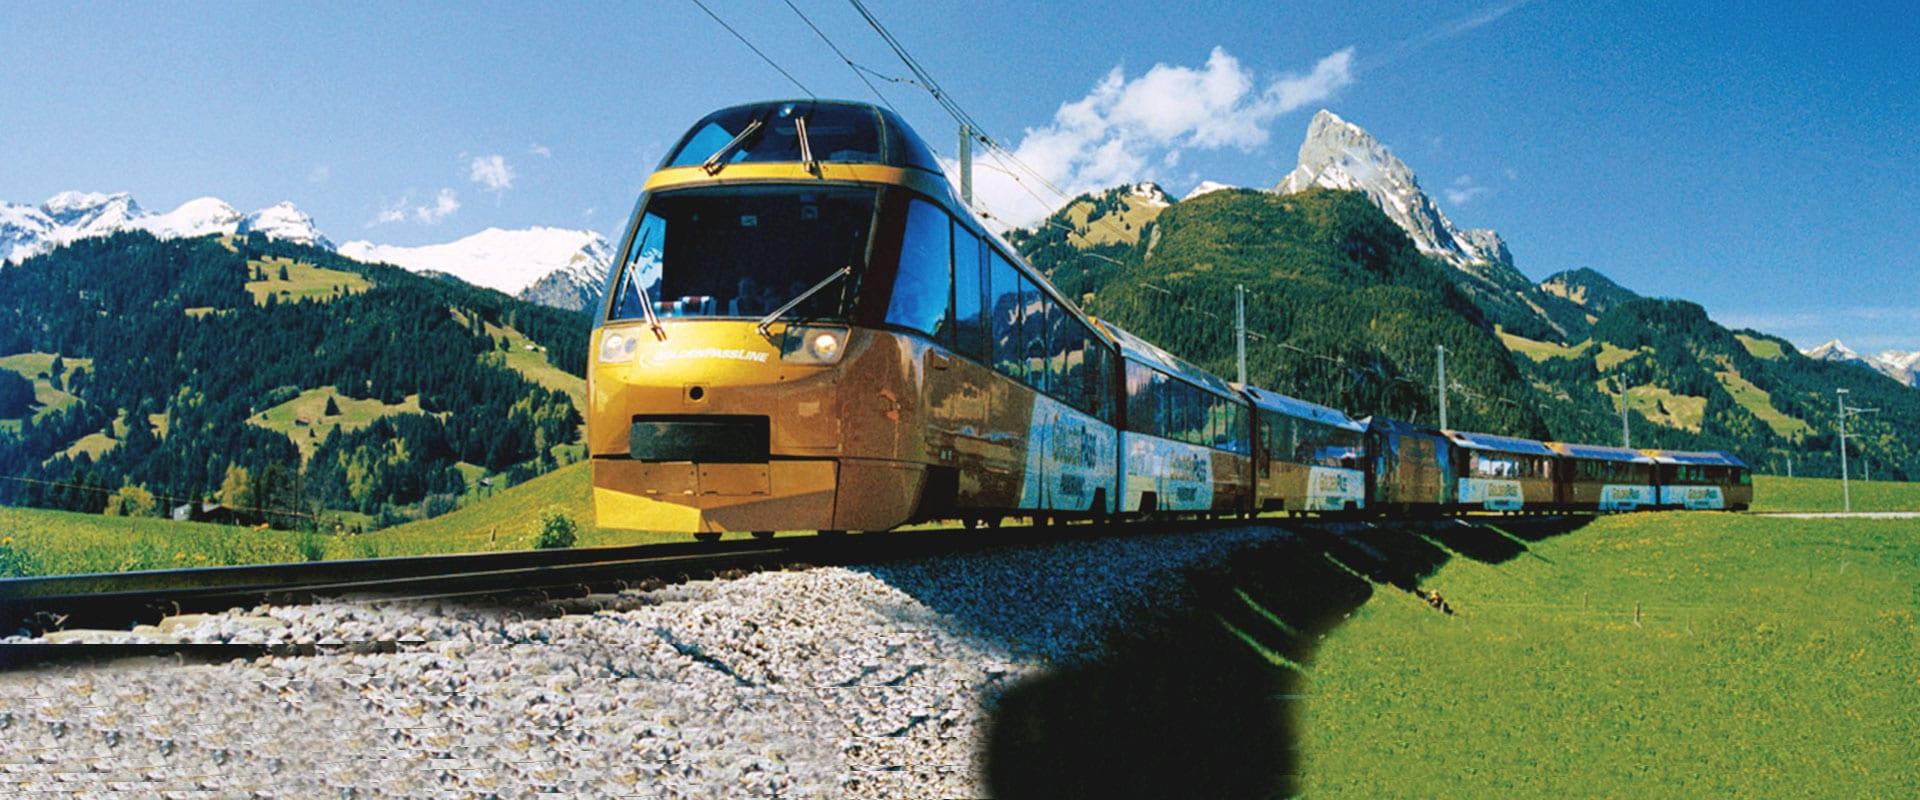 Trem de Interlaken para Lucerna